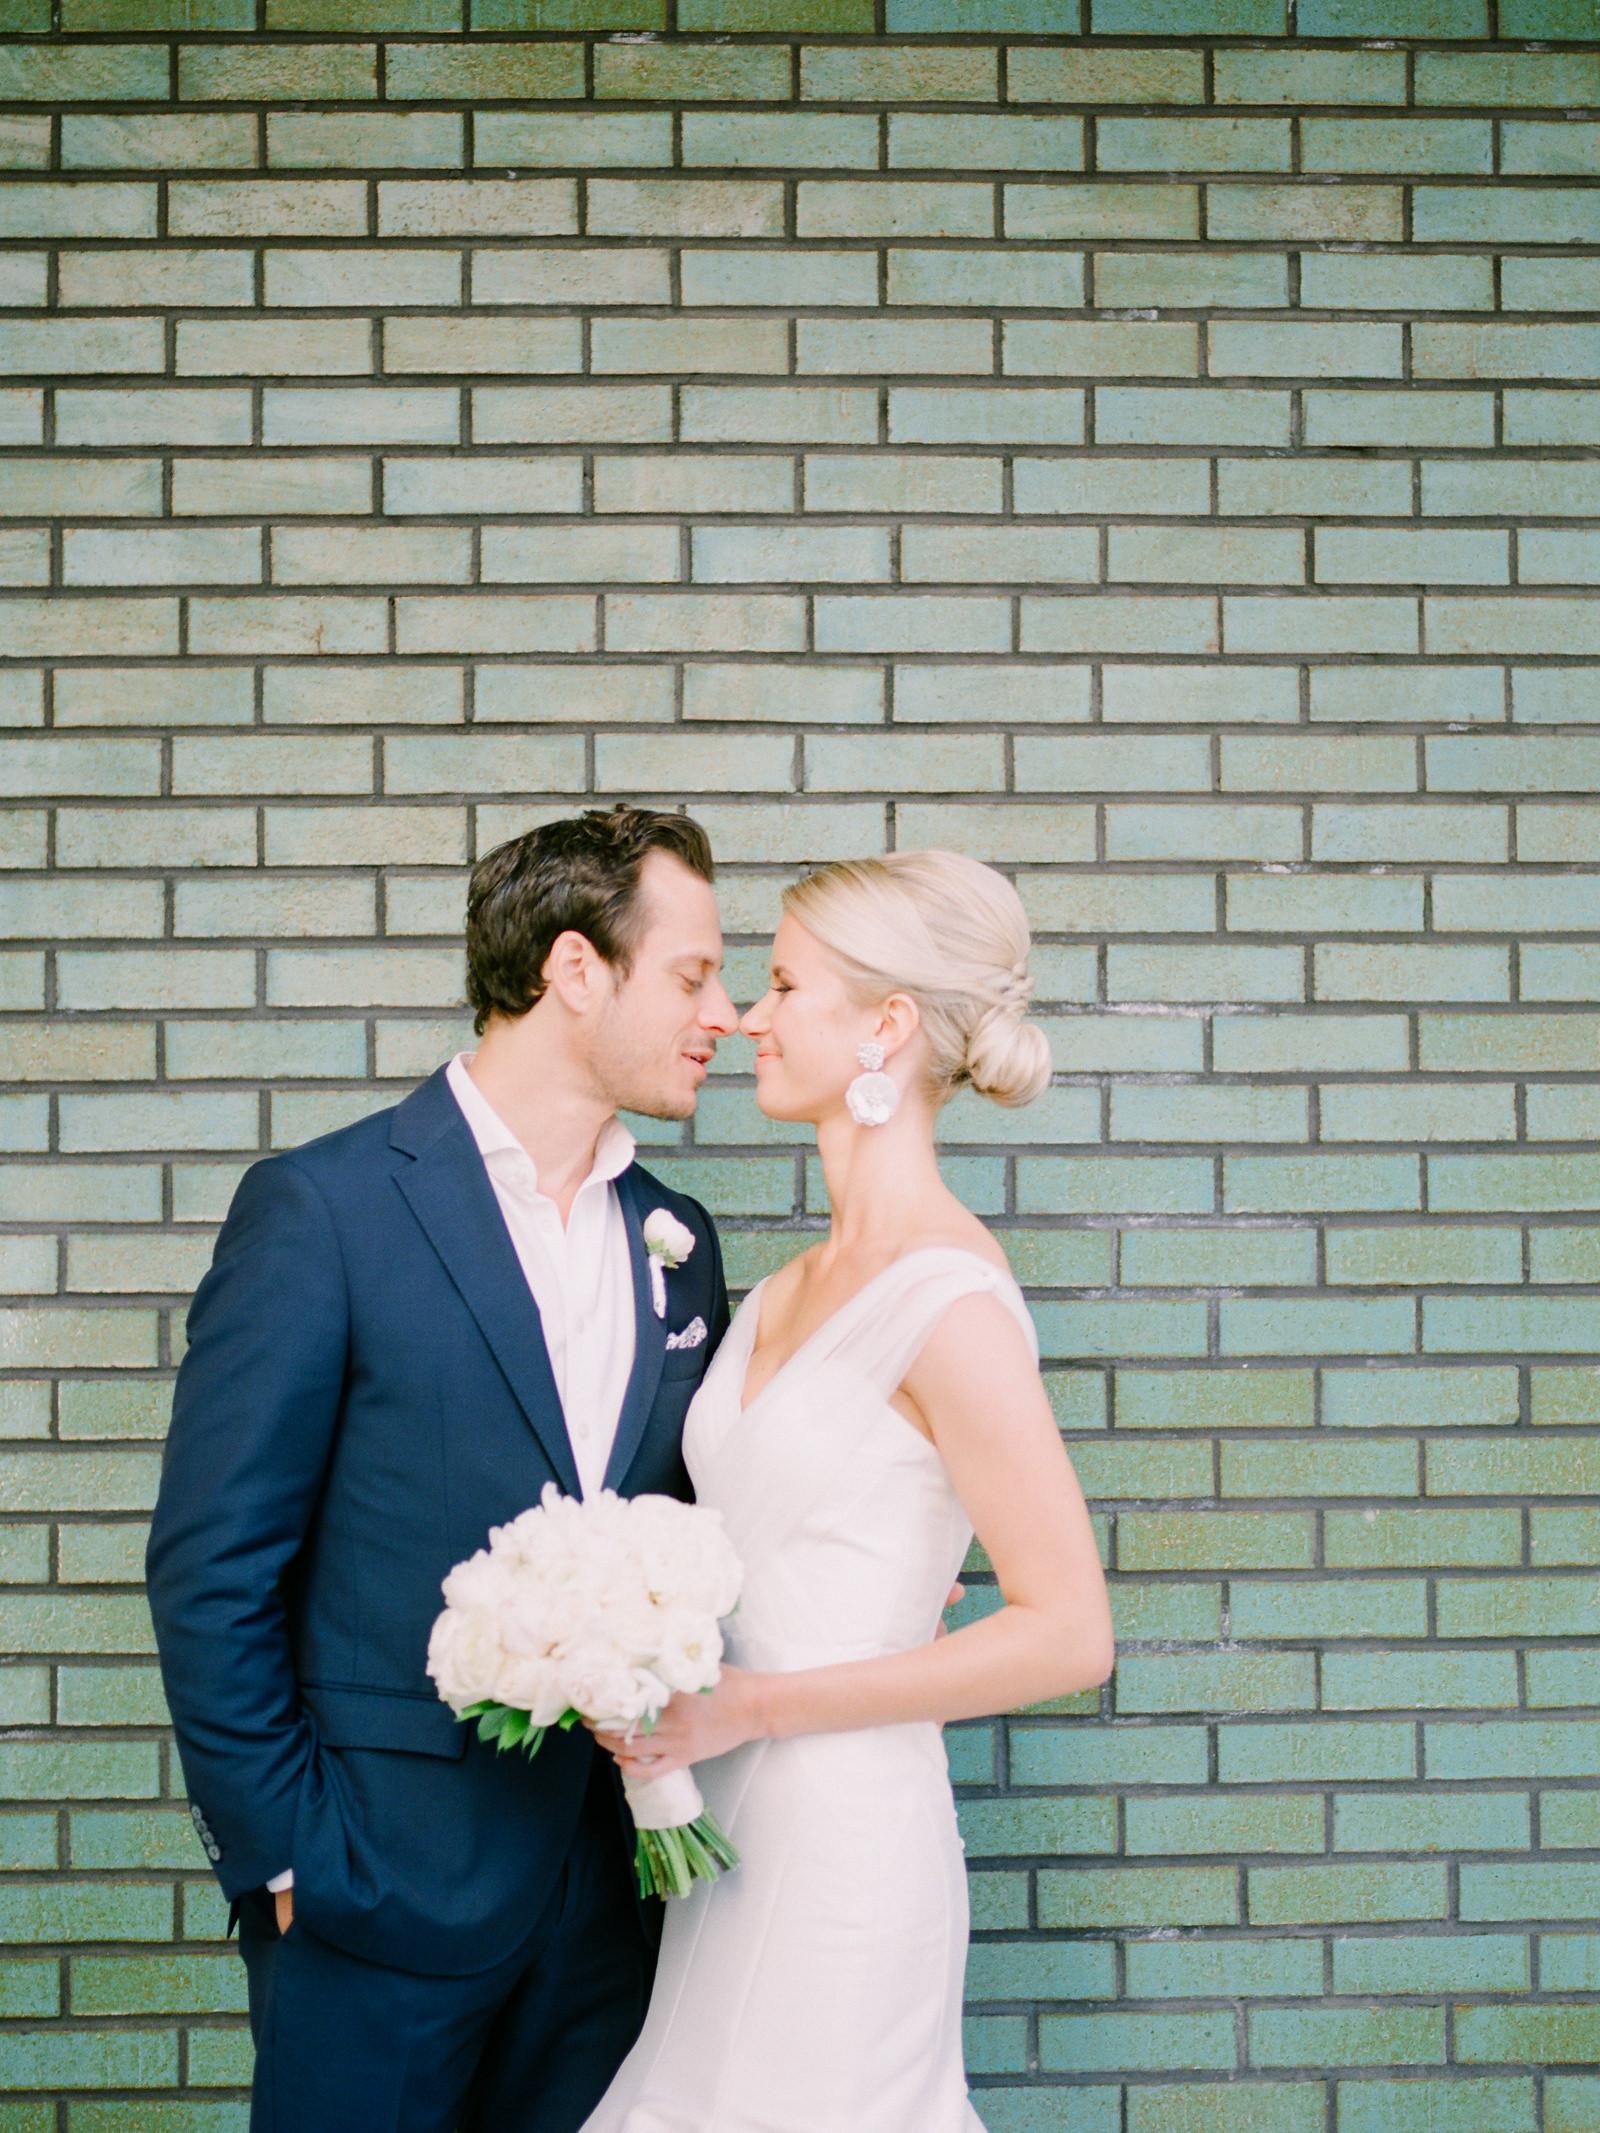 Intimate-NYC_wedding_ by Tanya Isaeva-81.jpg